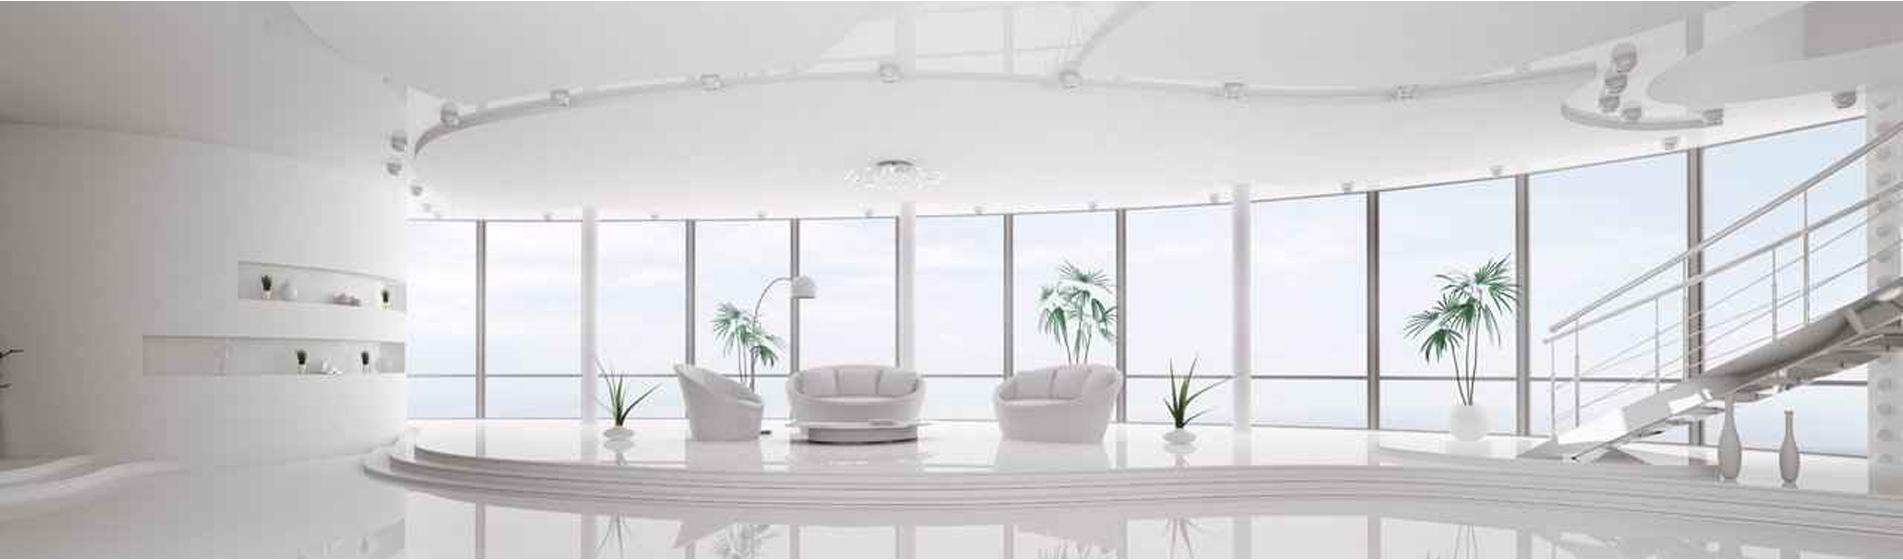 tarif baie vitree 30 Gard